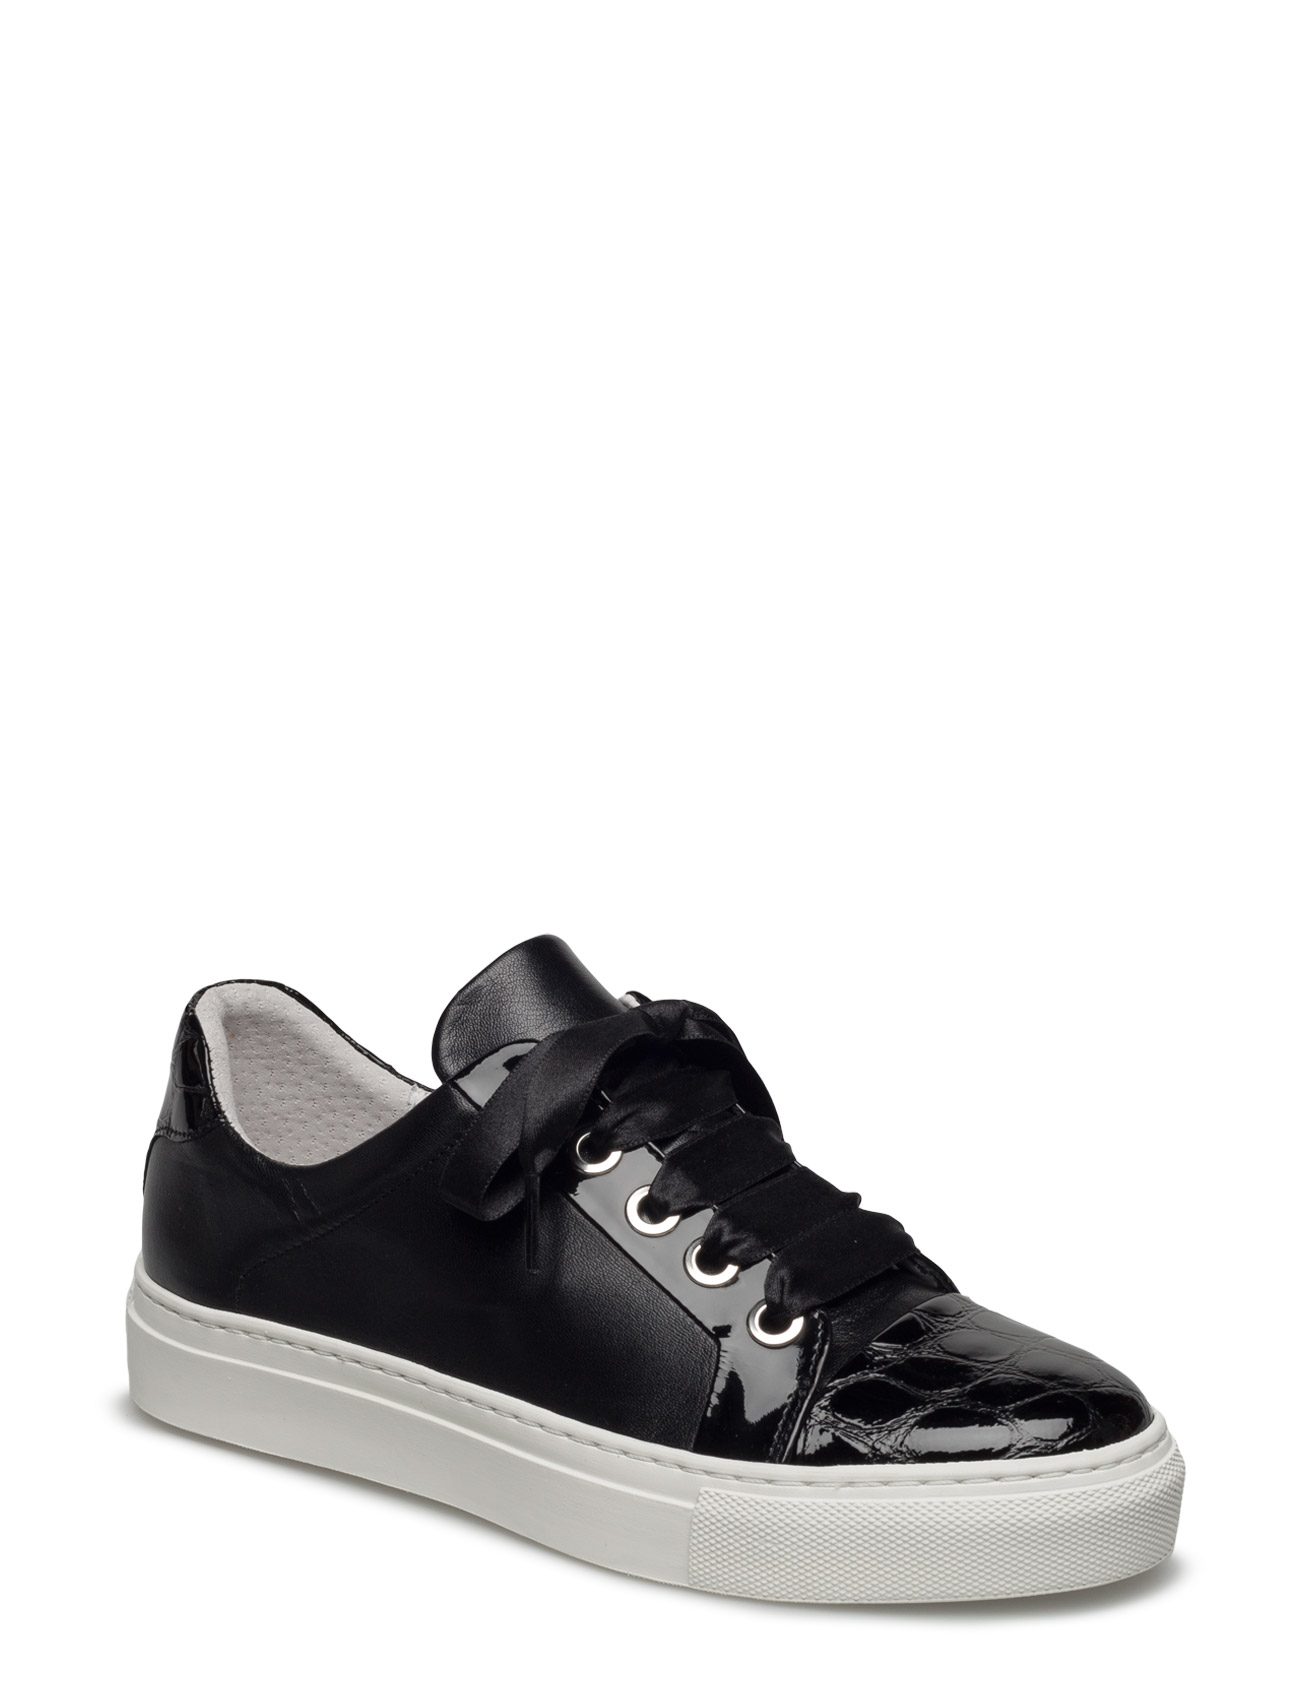 Shoes Billi Bi Sneakers til Damer i